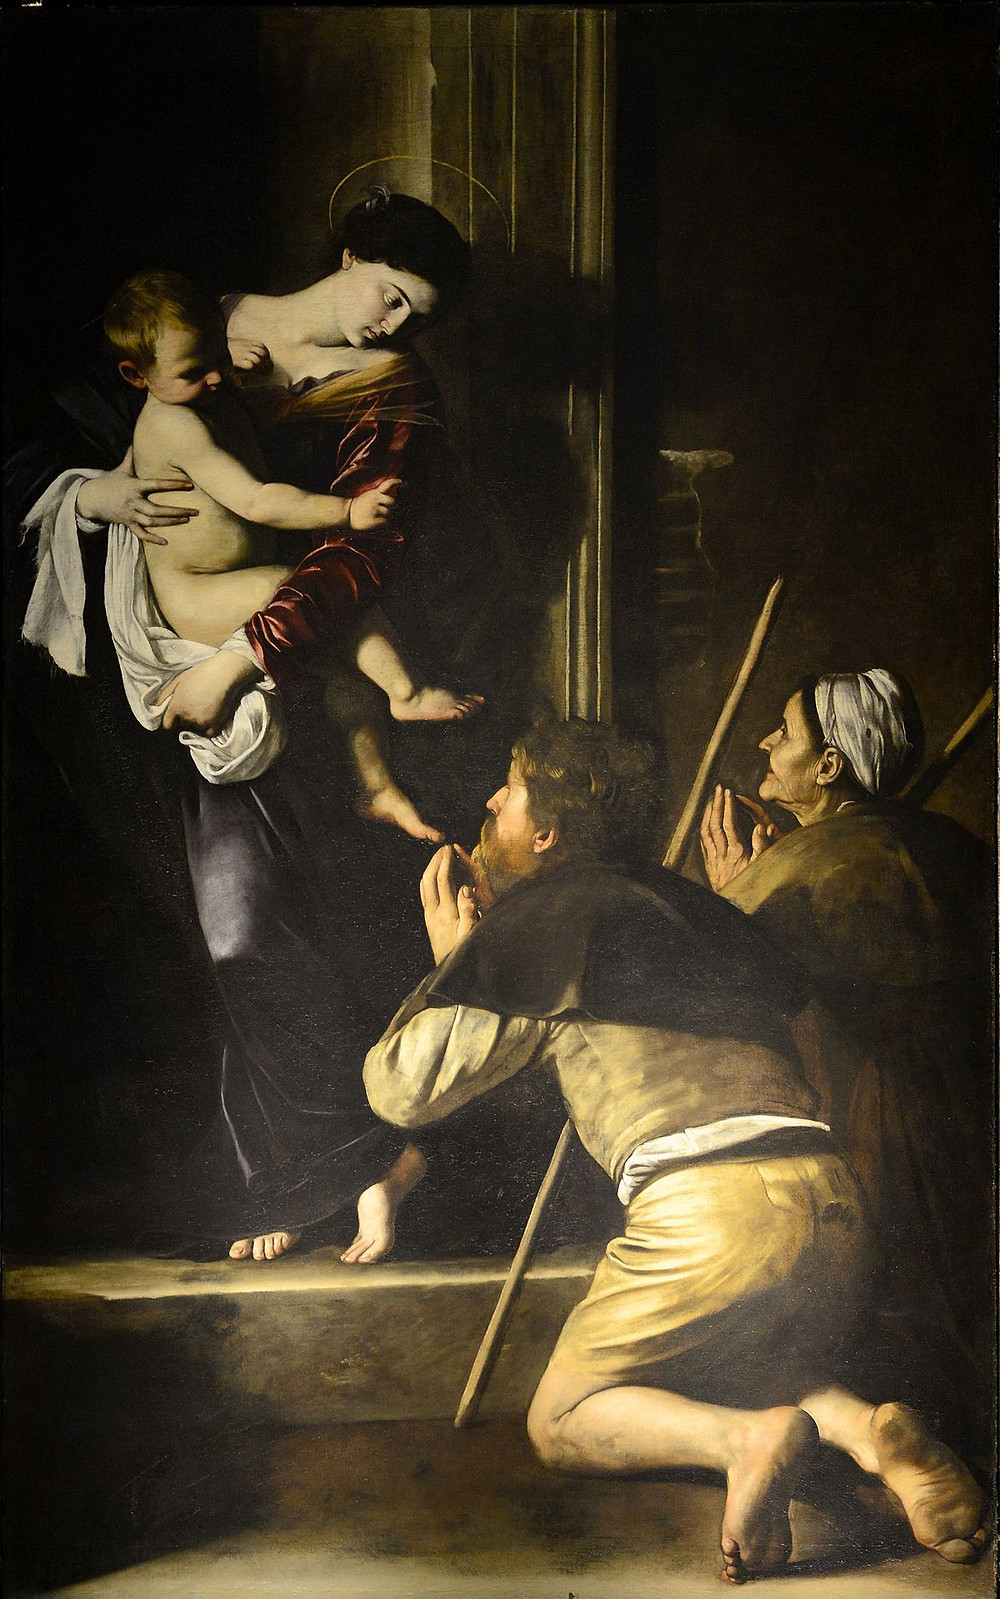 Caravaggio, Madonna di Loreto - Pilgrim's Madonna,1604-1606)